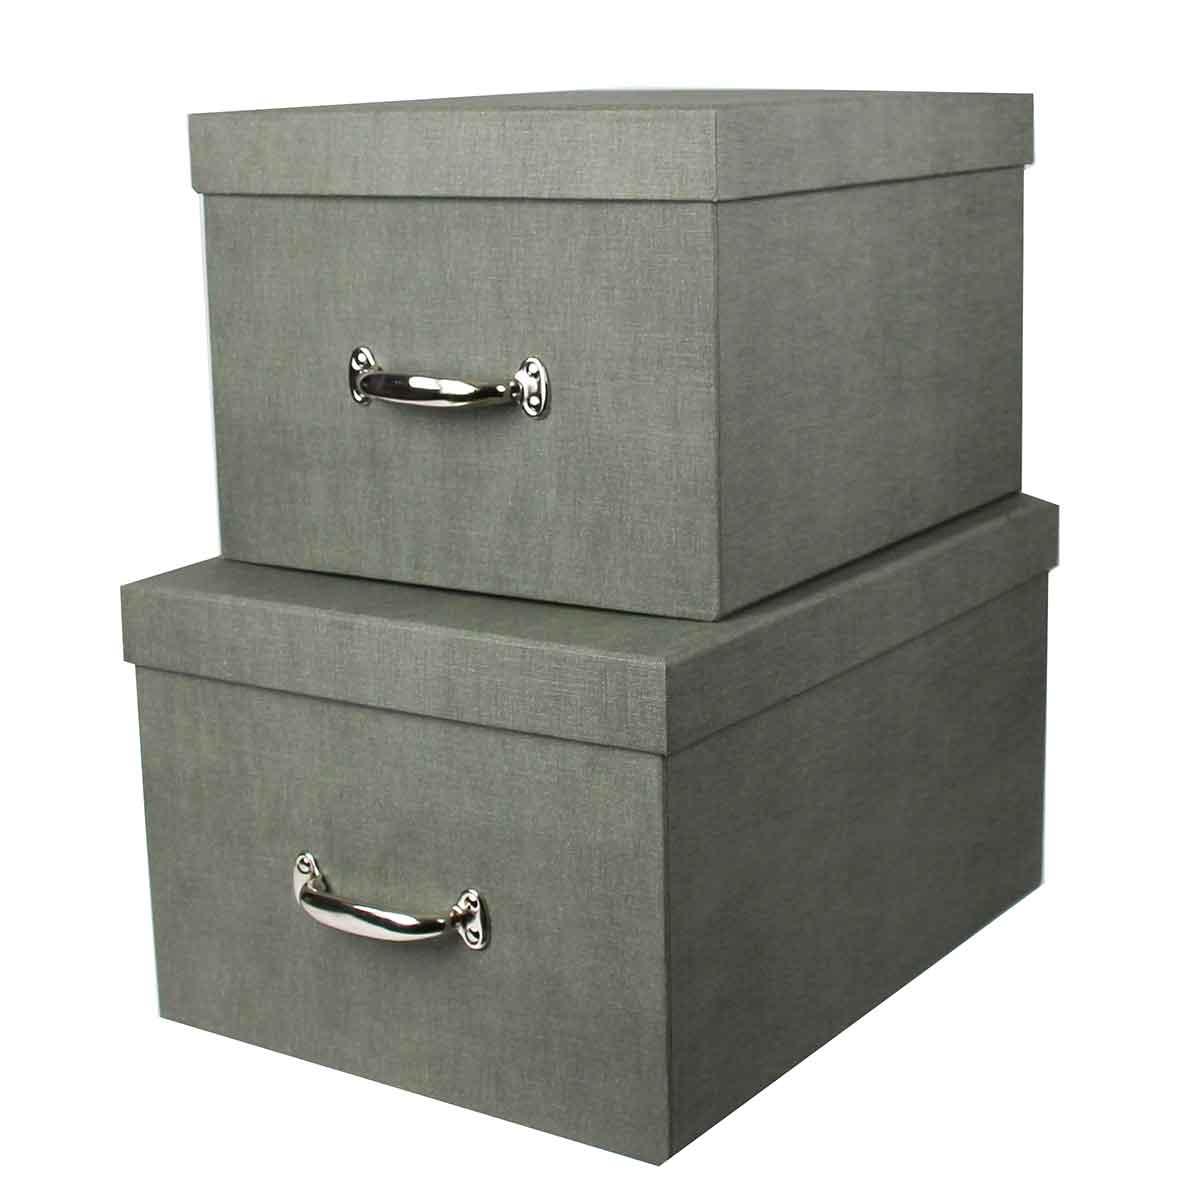 14b6bba4d3 Rangement vêtements - bacs, boîtes, paniers - ON RANGE TOUT